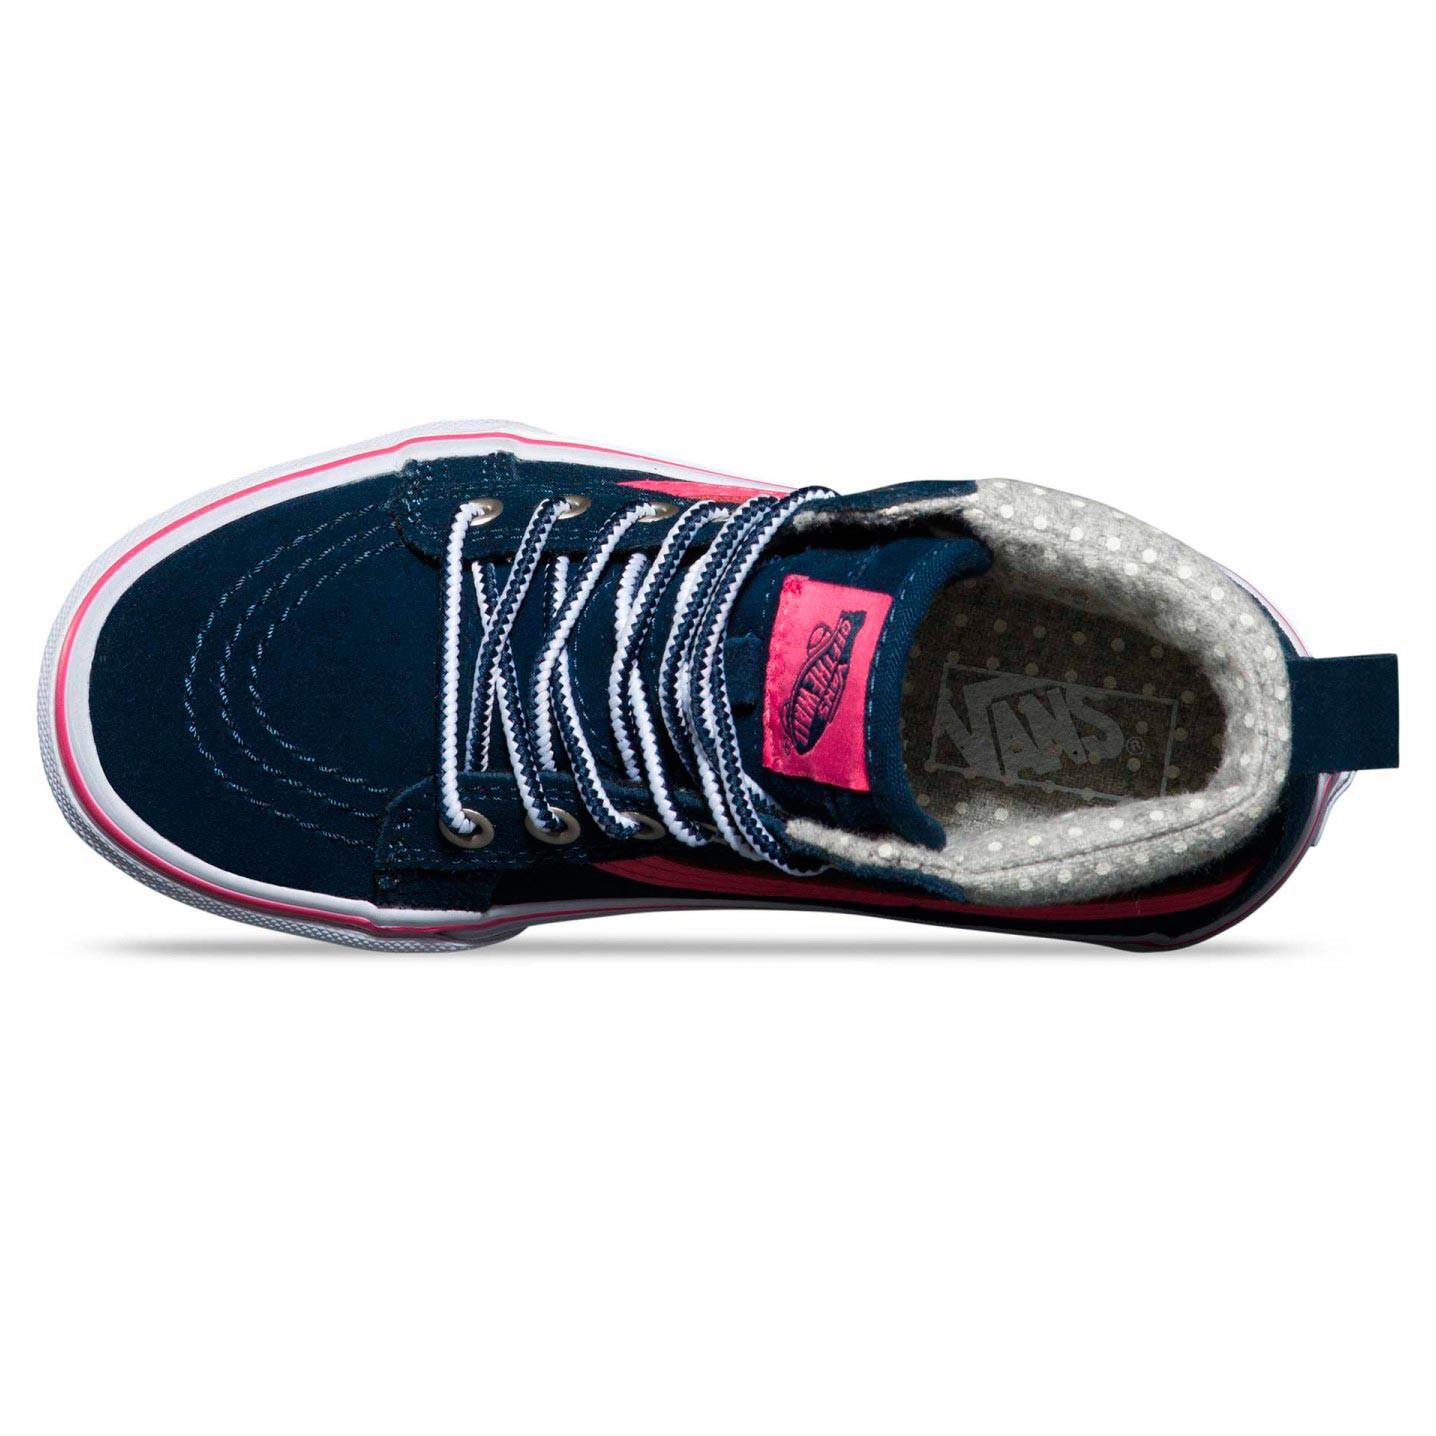 Zimné topánky Vans Sk8-Hi Mte navy pink  0bcd1e6a362